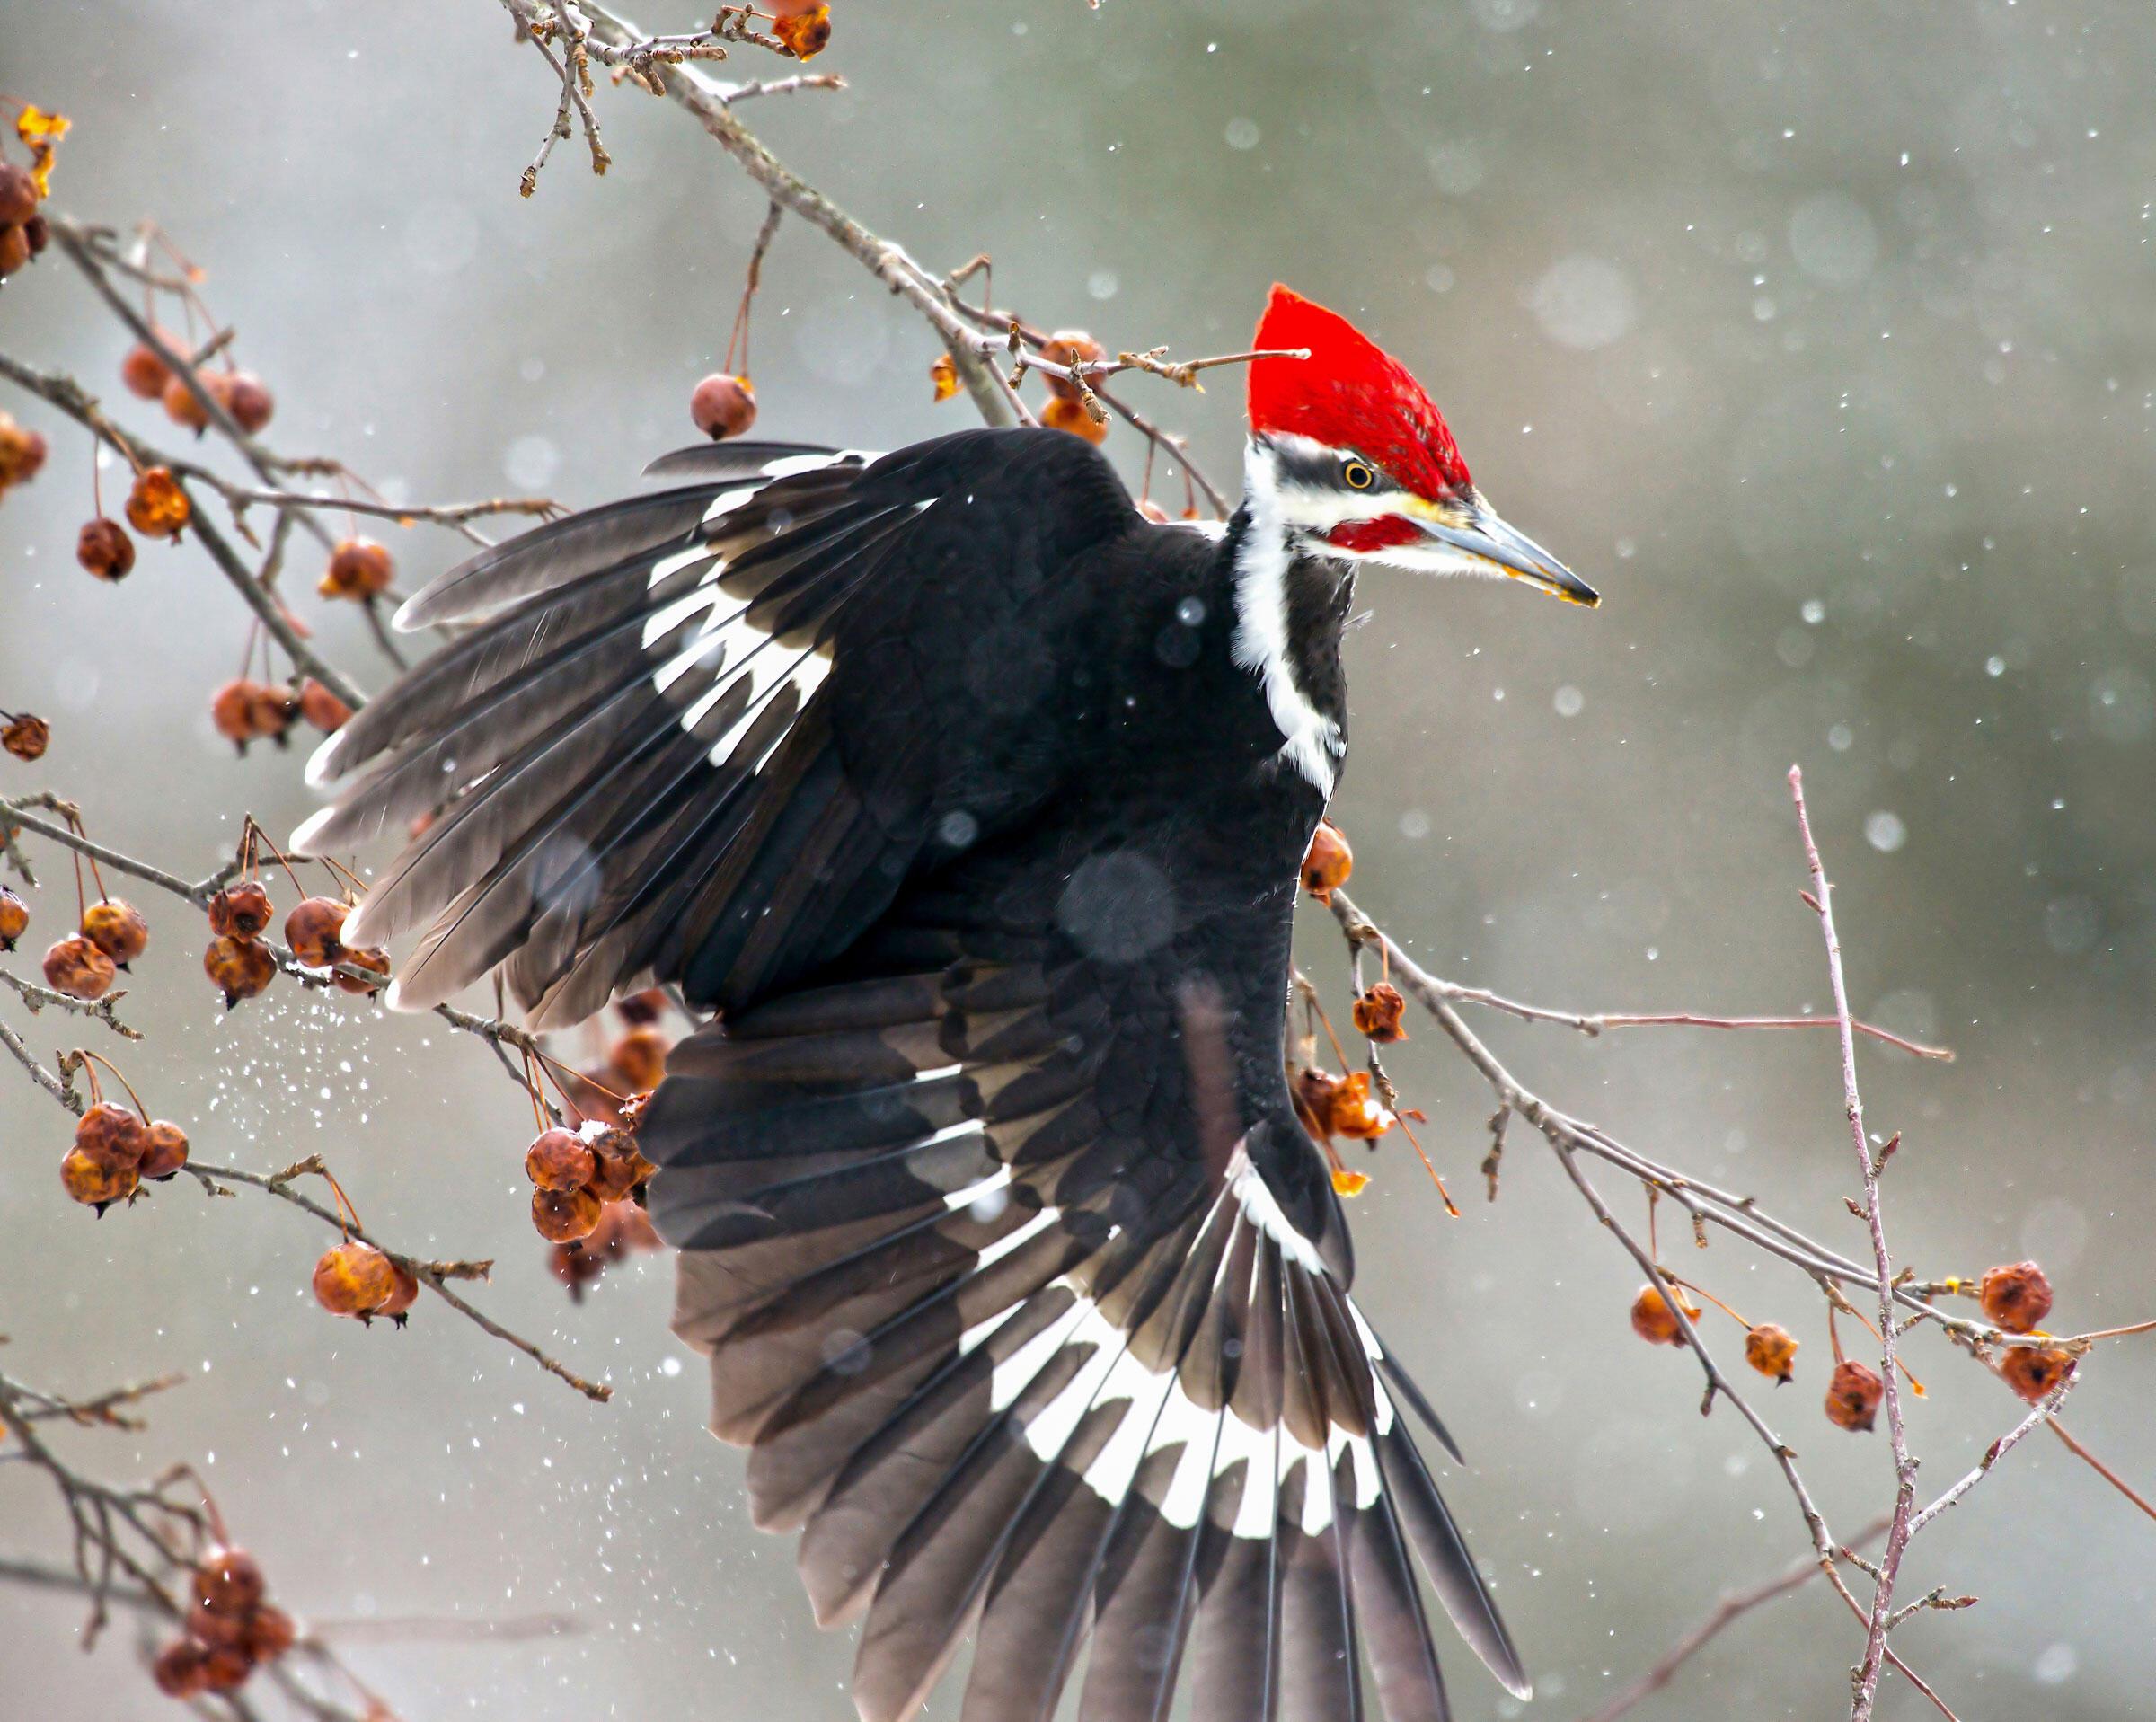 Pileated Woodpecker/Professional Category. Pamela Underhill Karaz/Audubon Photography Awards